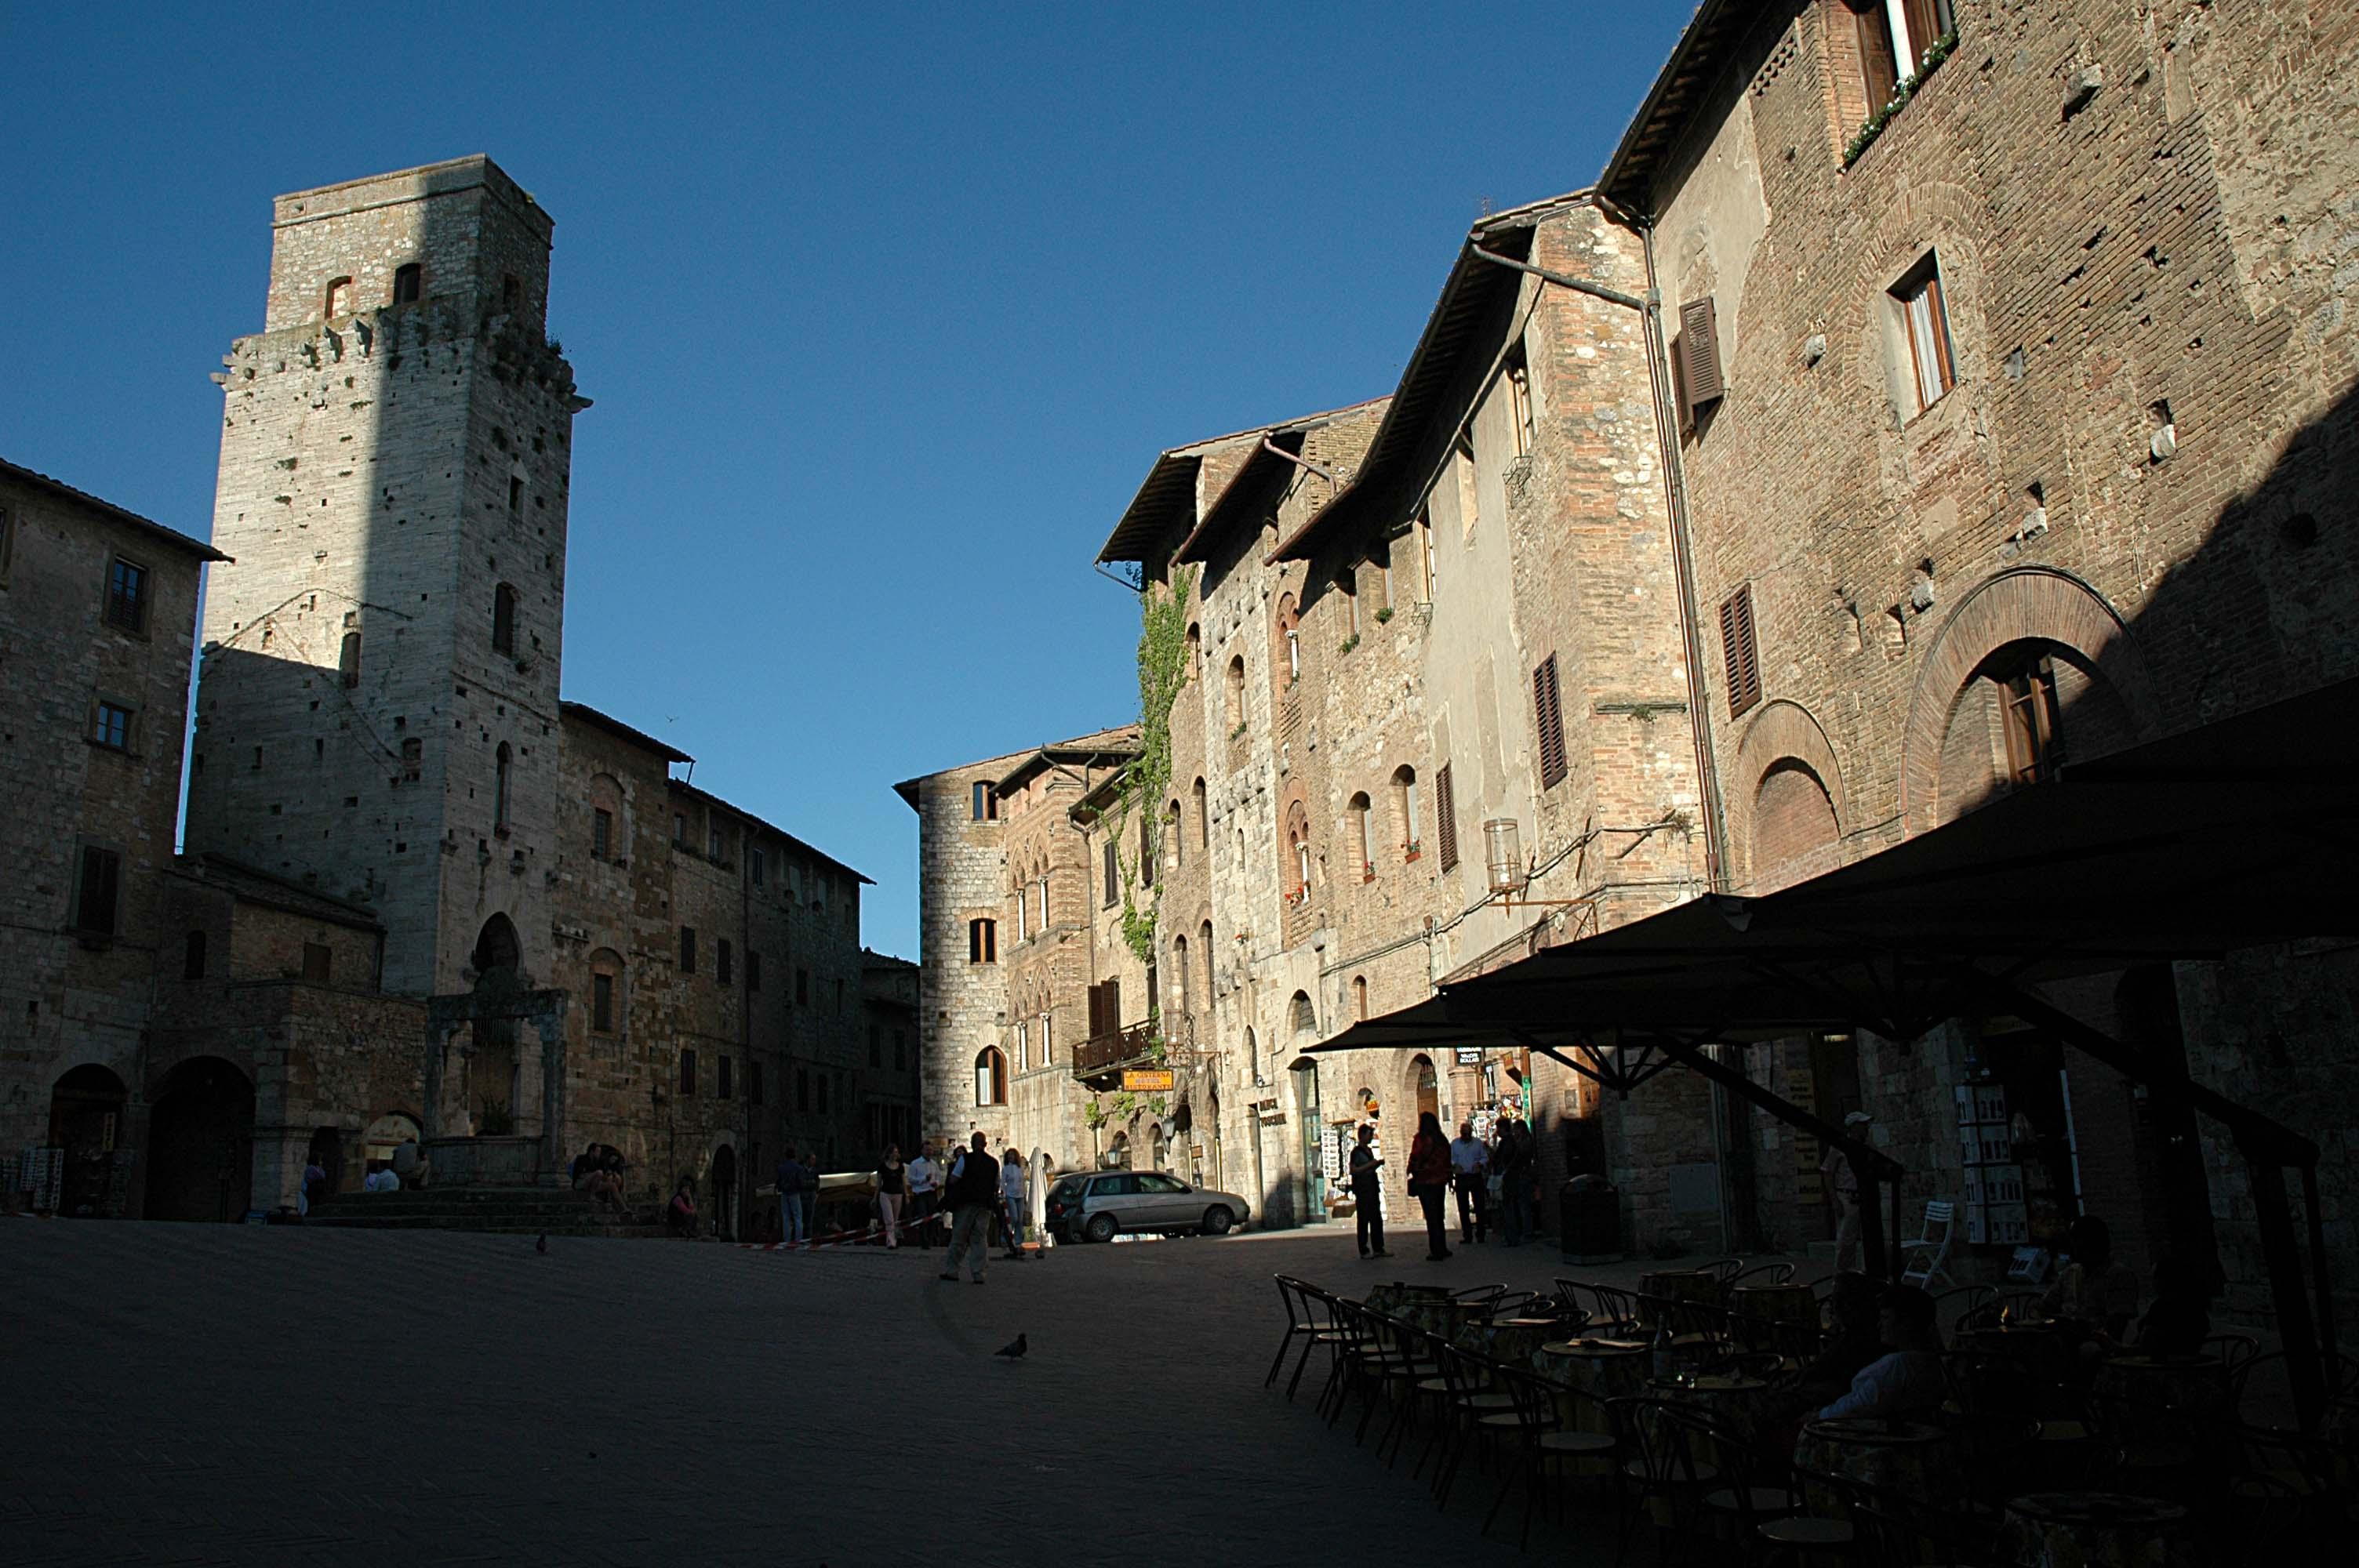 San Geminiano 2